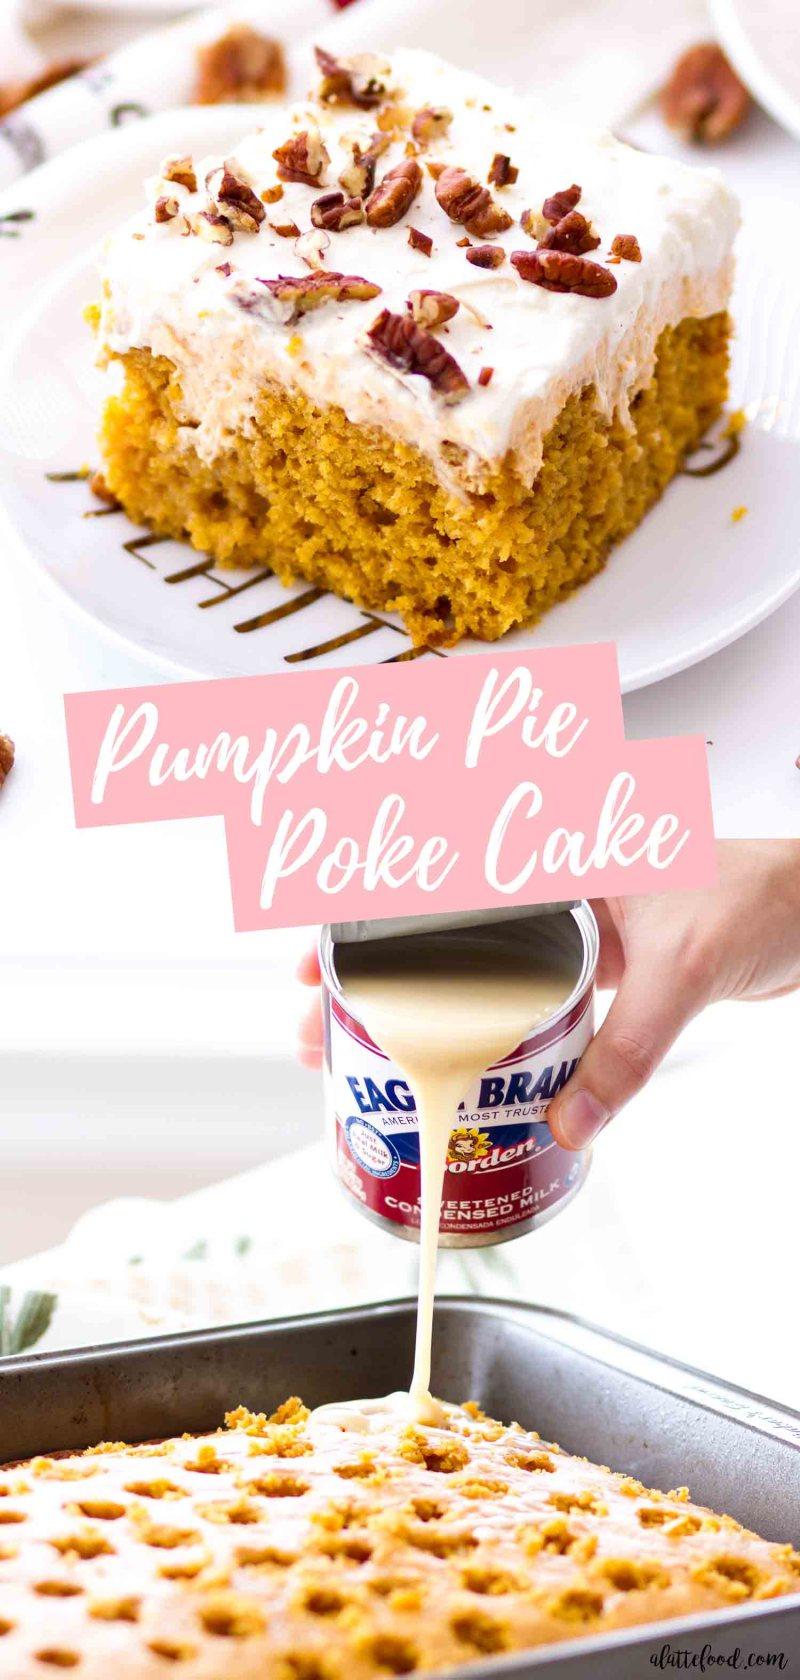 pumpkin pie poke cake collage